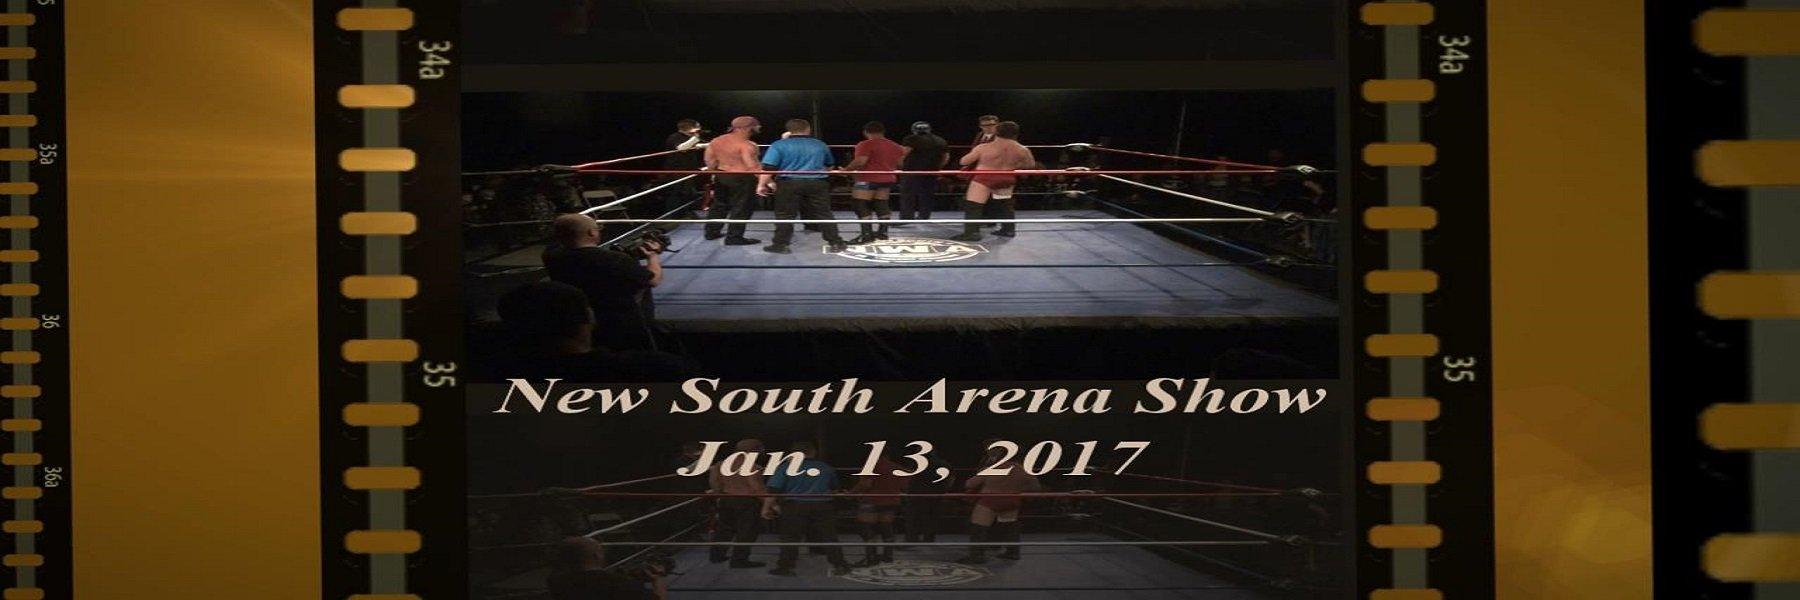 Arena Show Jan. 13 2017